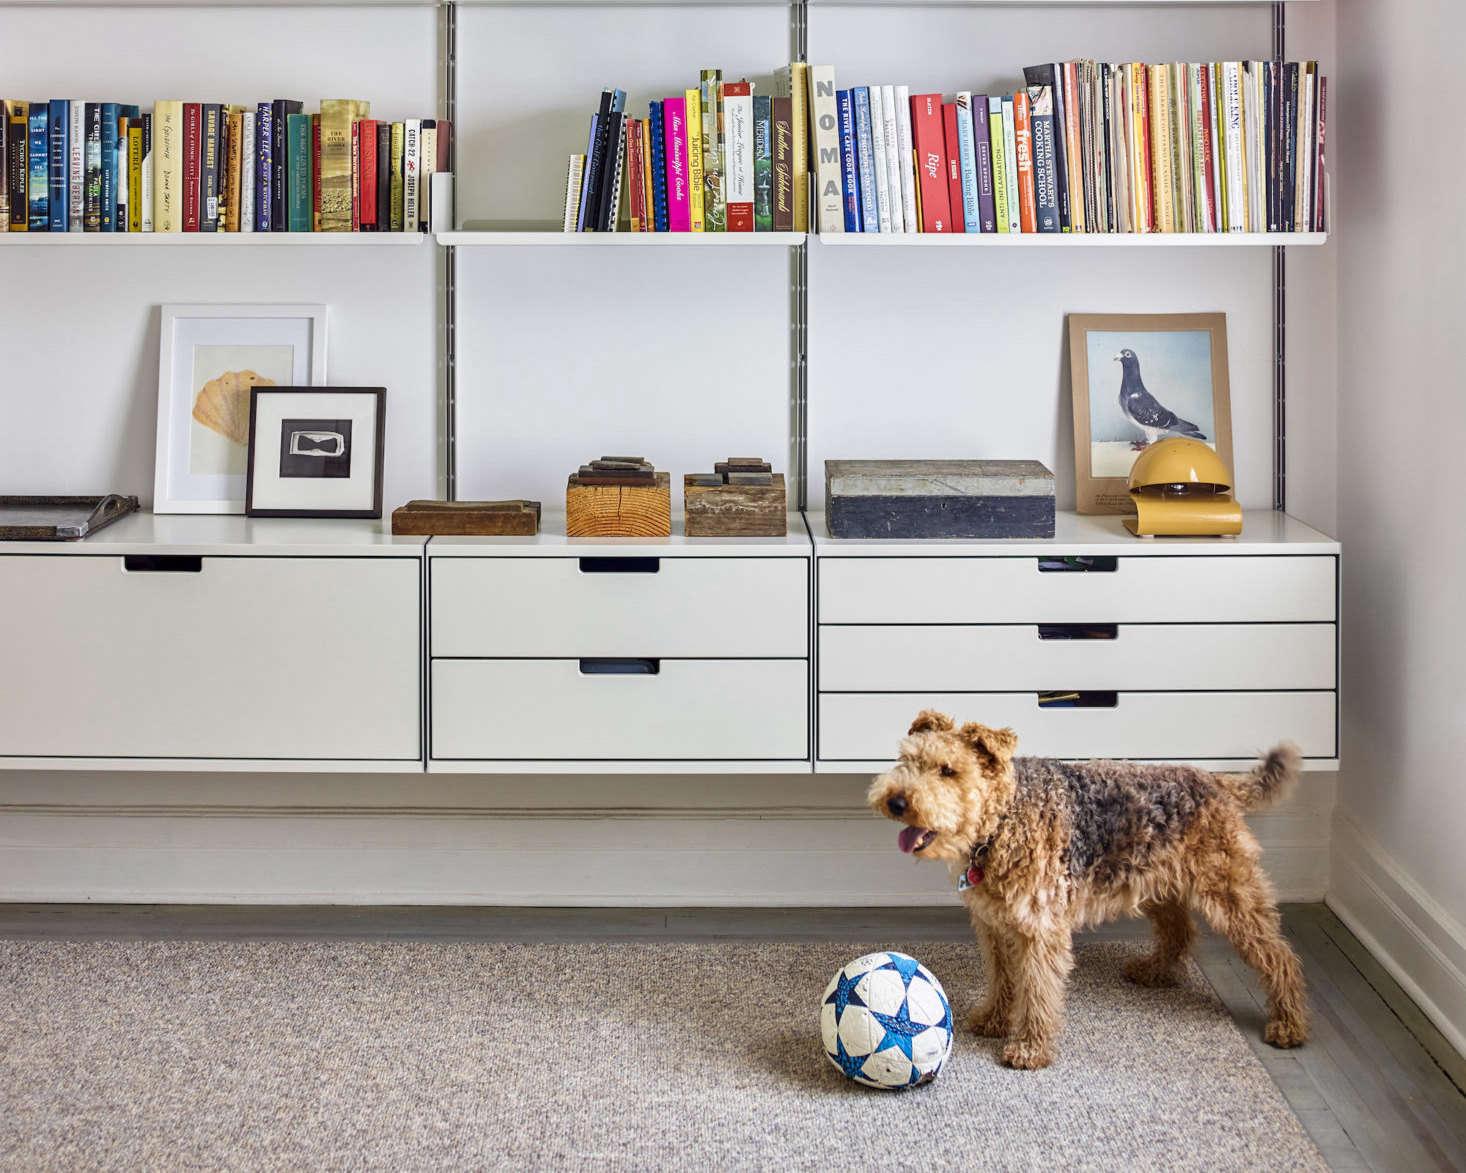 Aha! Design: The Organized Home, Dog-Friendly Edition